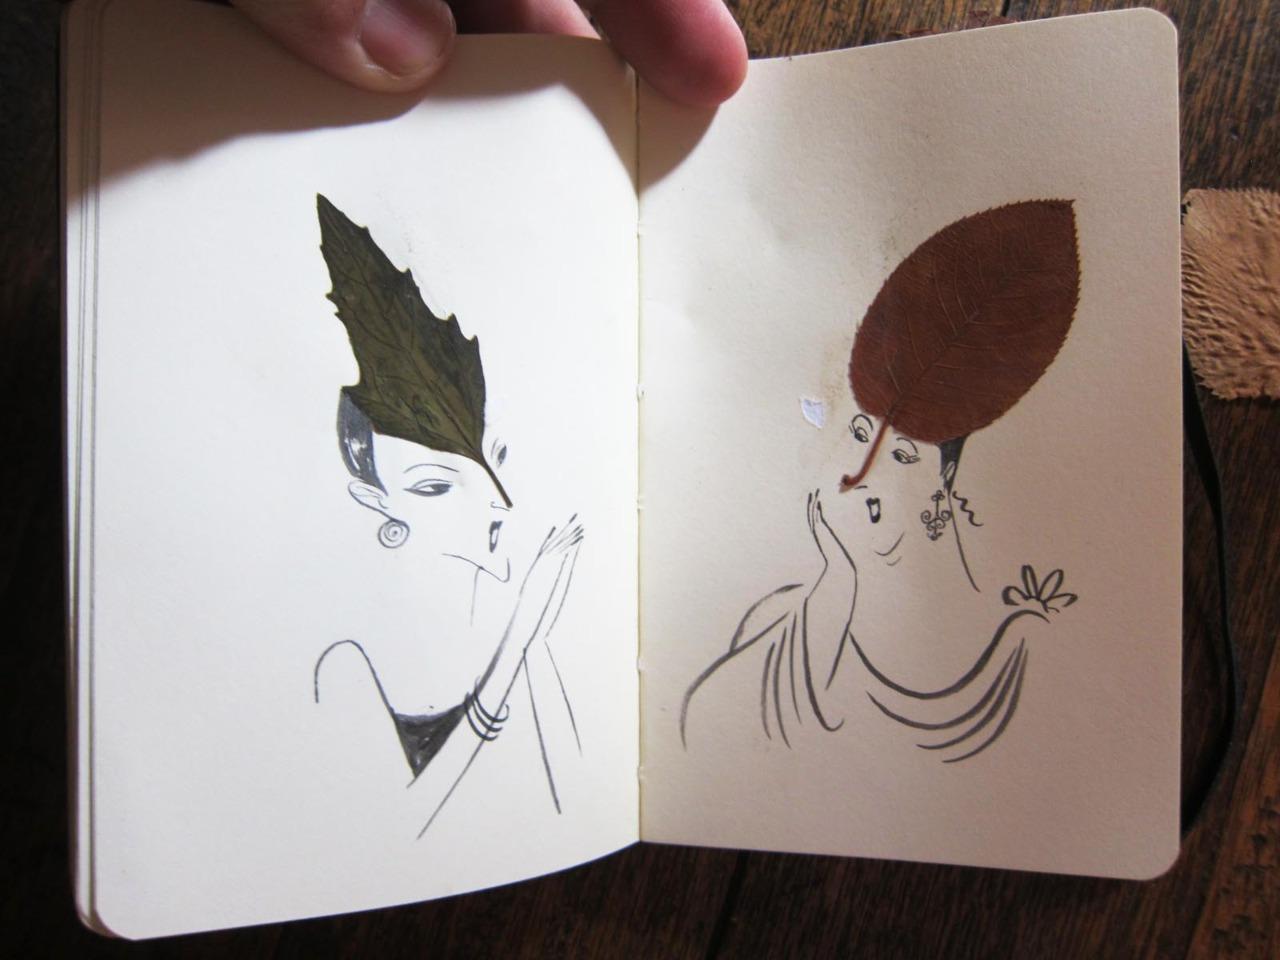 herbier feuille illustration 05 Un herbier illustré